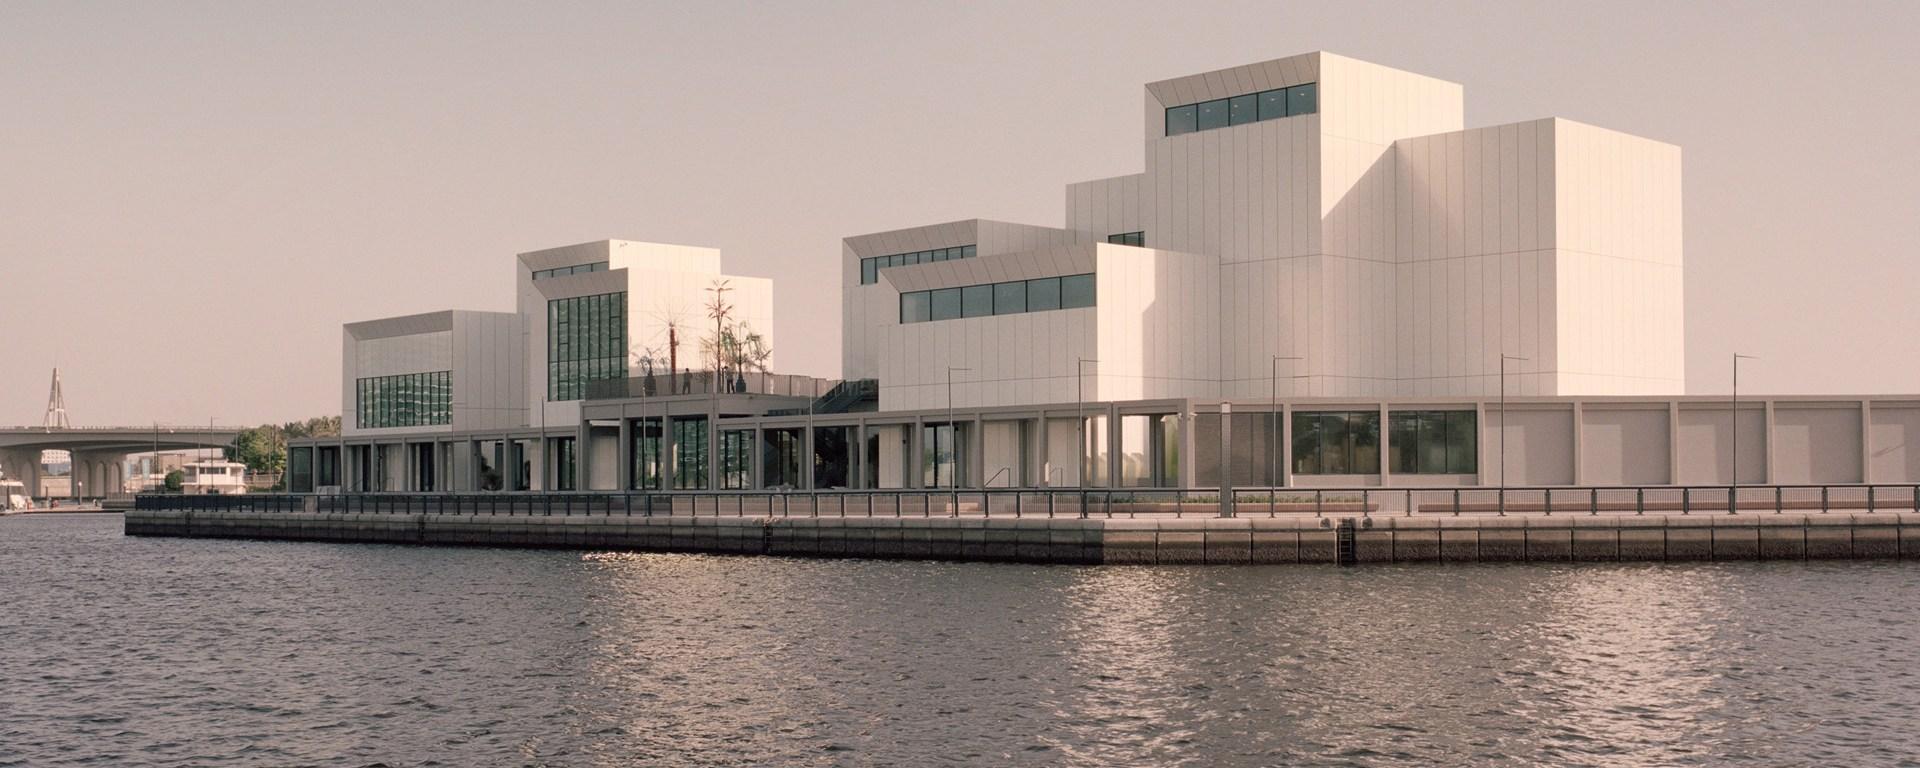 Jameel Arts Centre. Photo credit Rory Gardiner. Courtesy of Jameel Arts Centre, Dubai